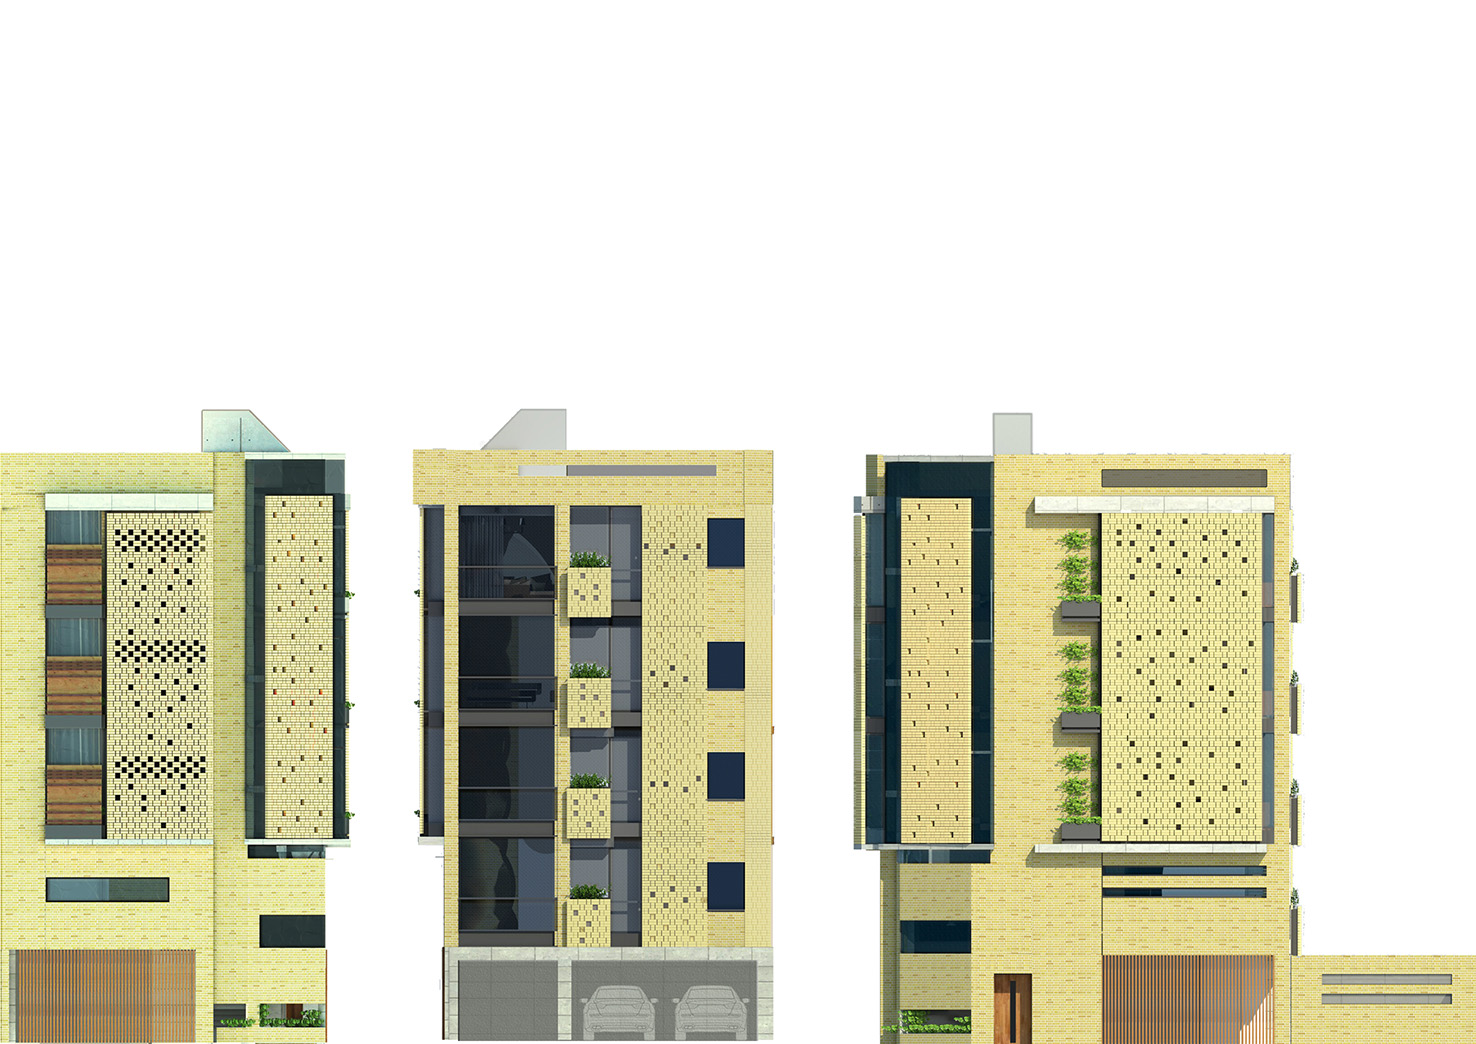 Yeprim-Khan Apartment